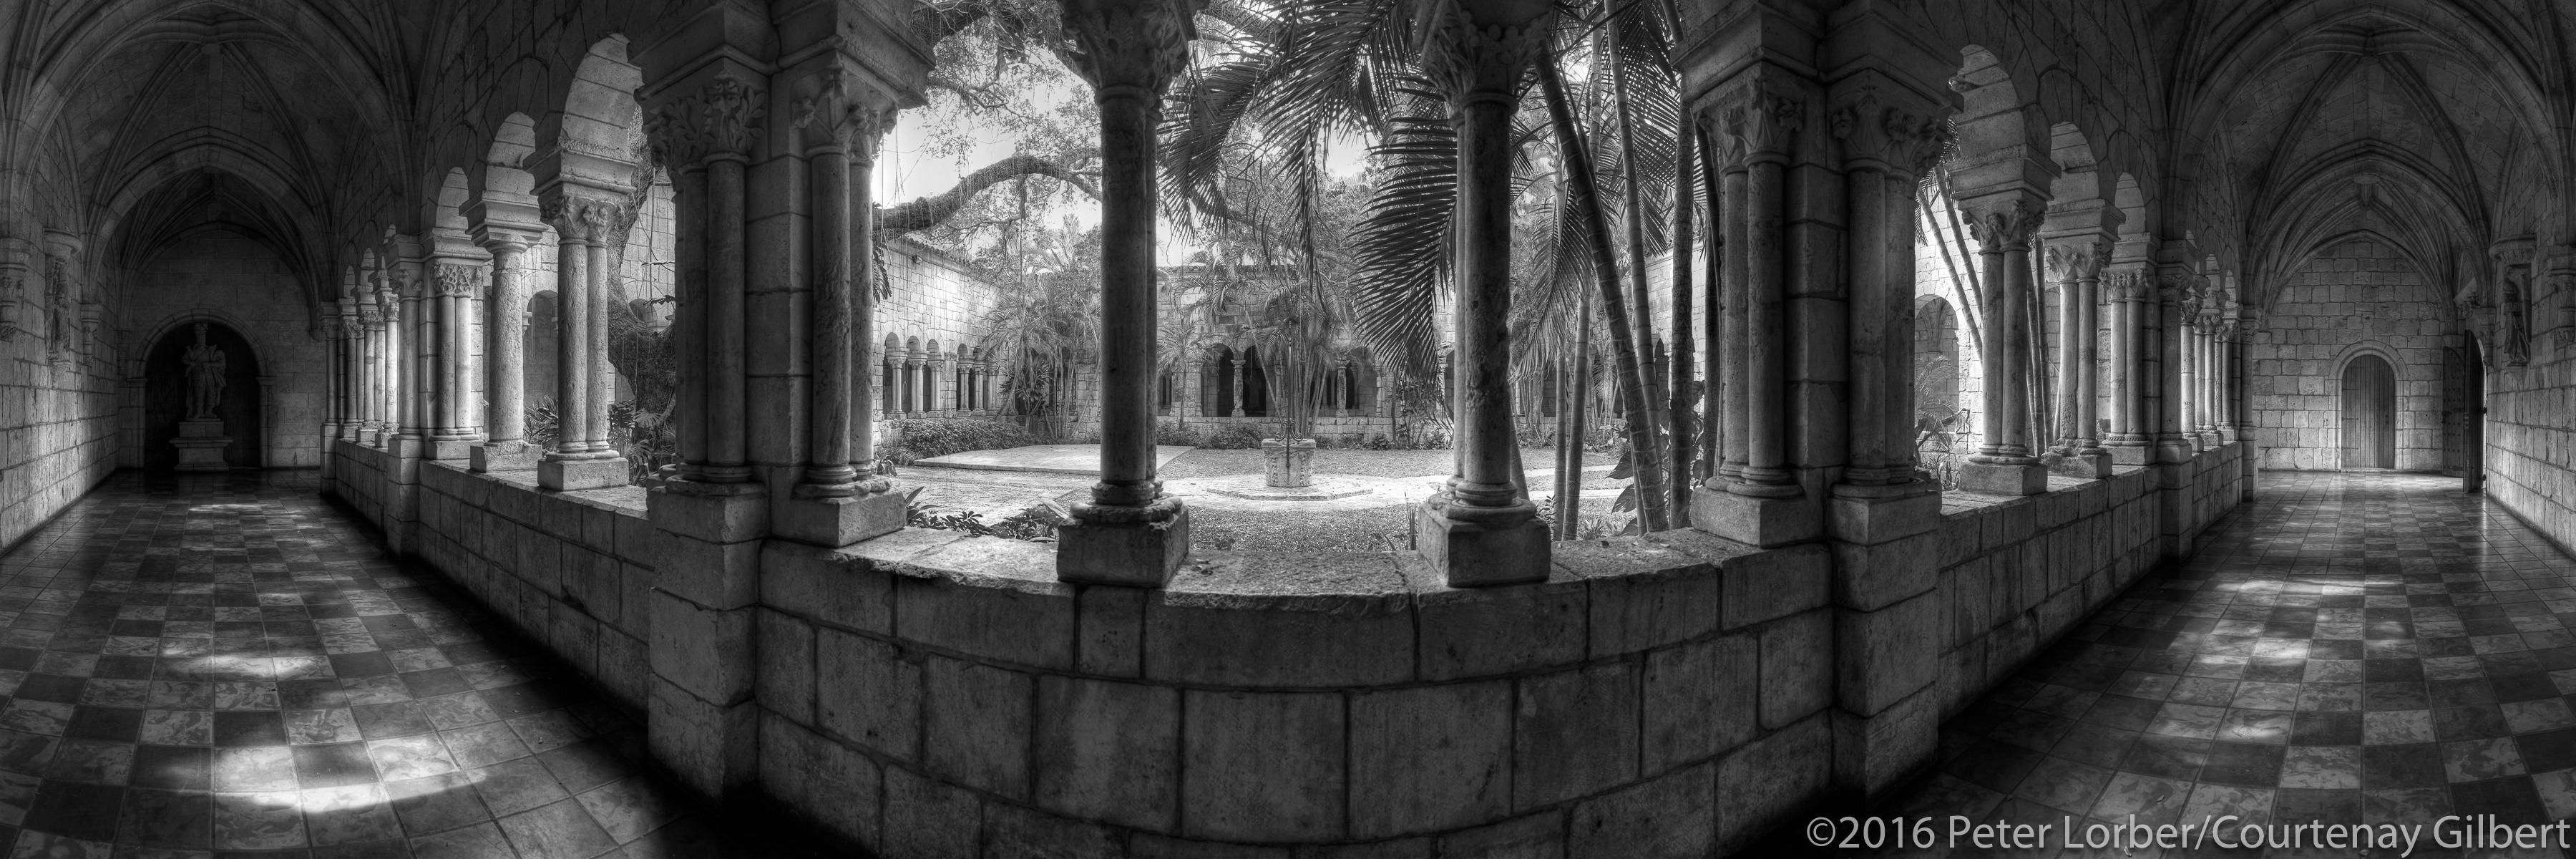 Ancient Spanish Monastery II